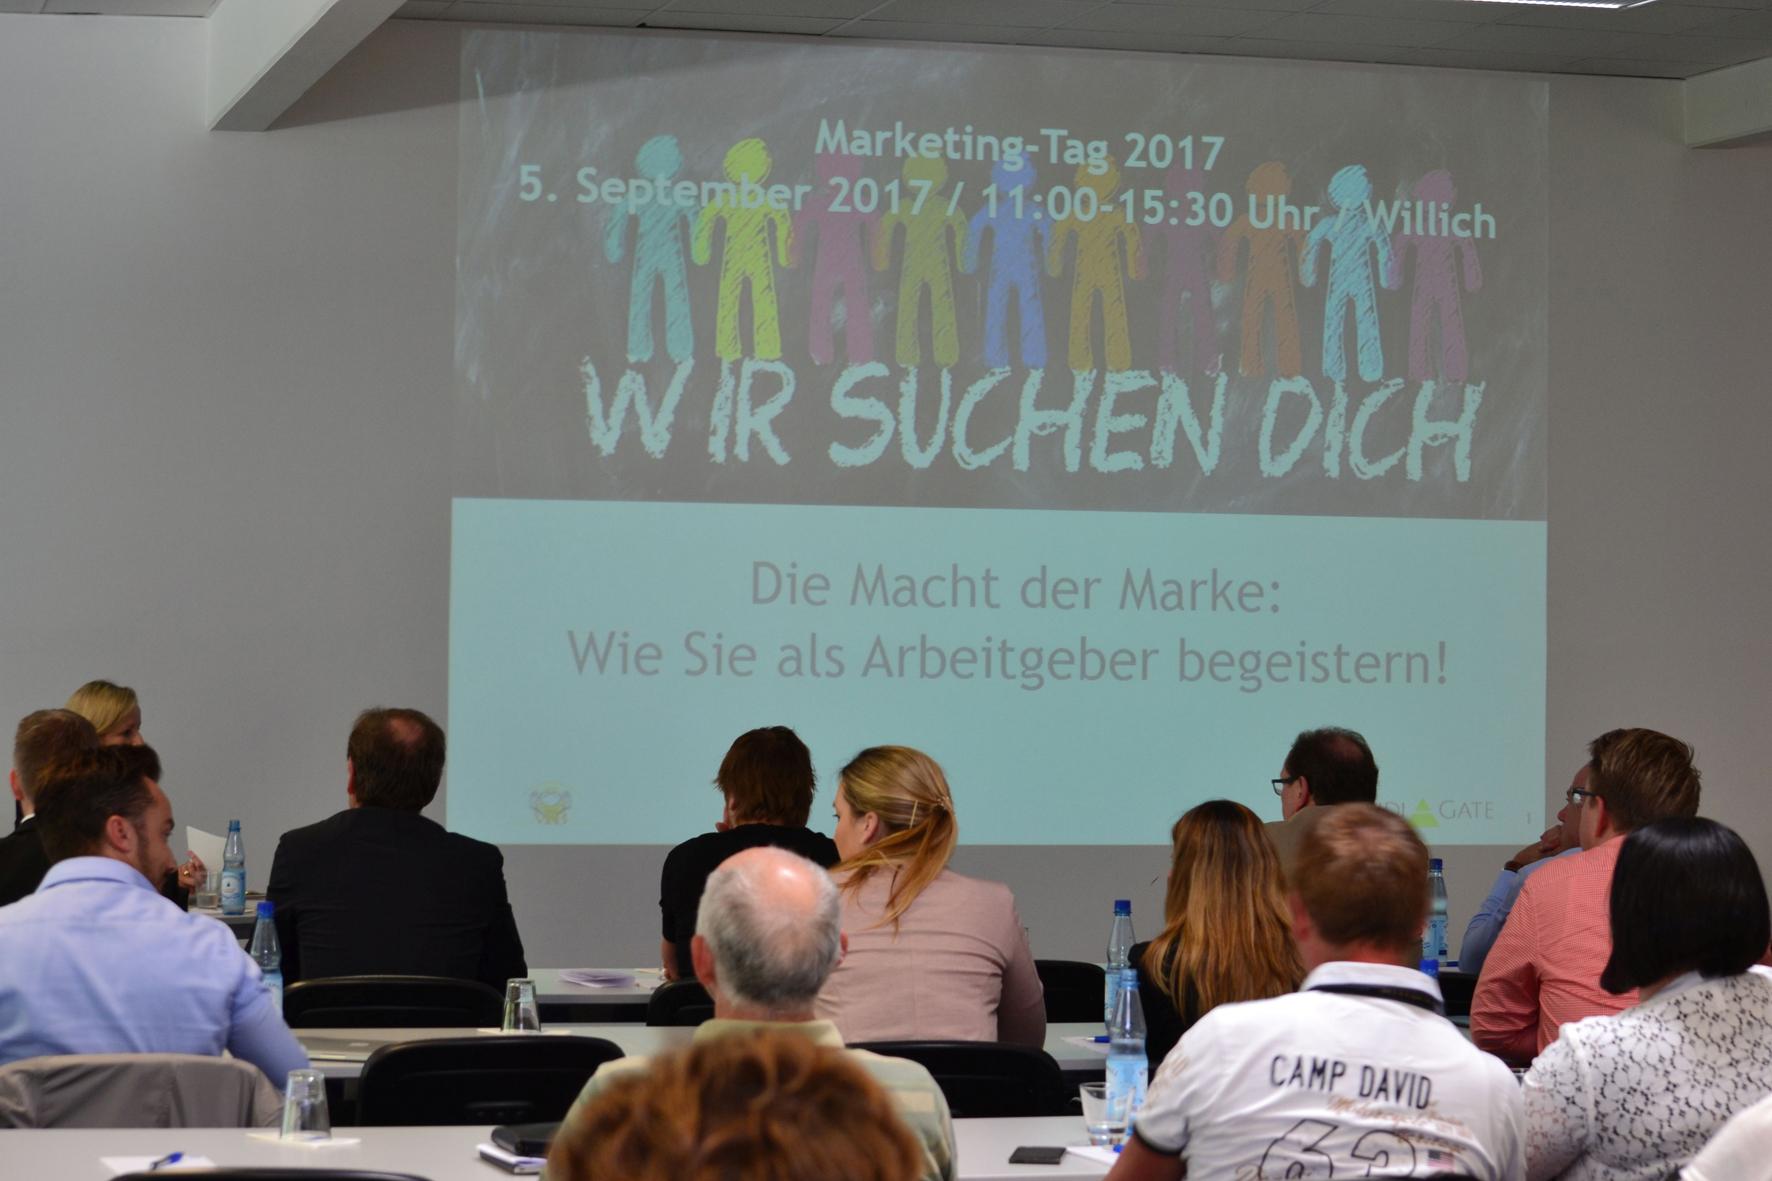 Marketing-Tag